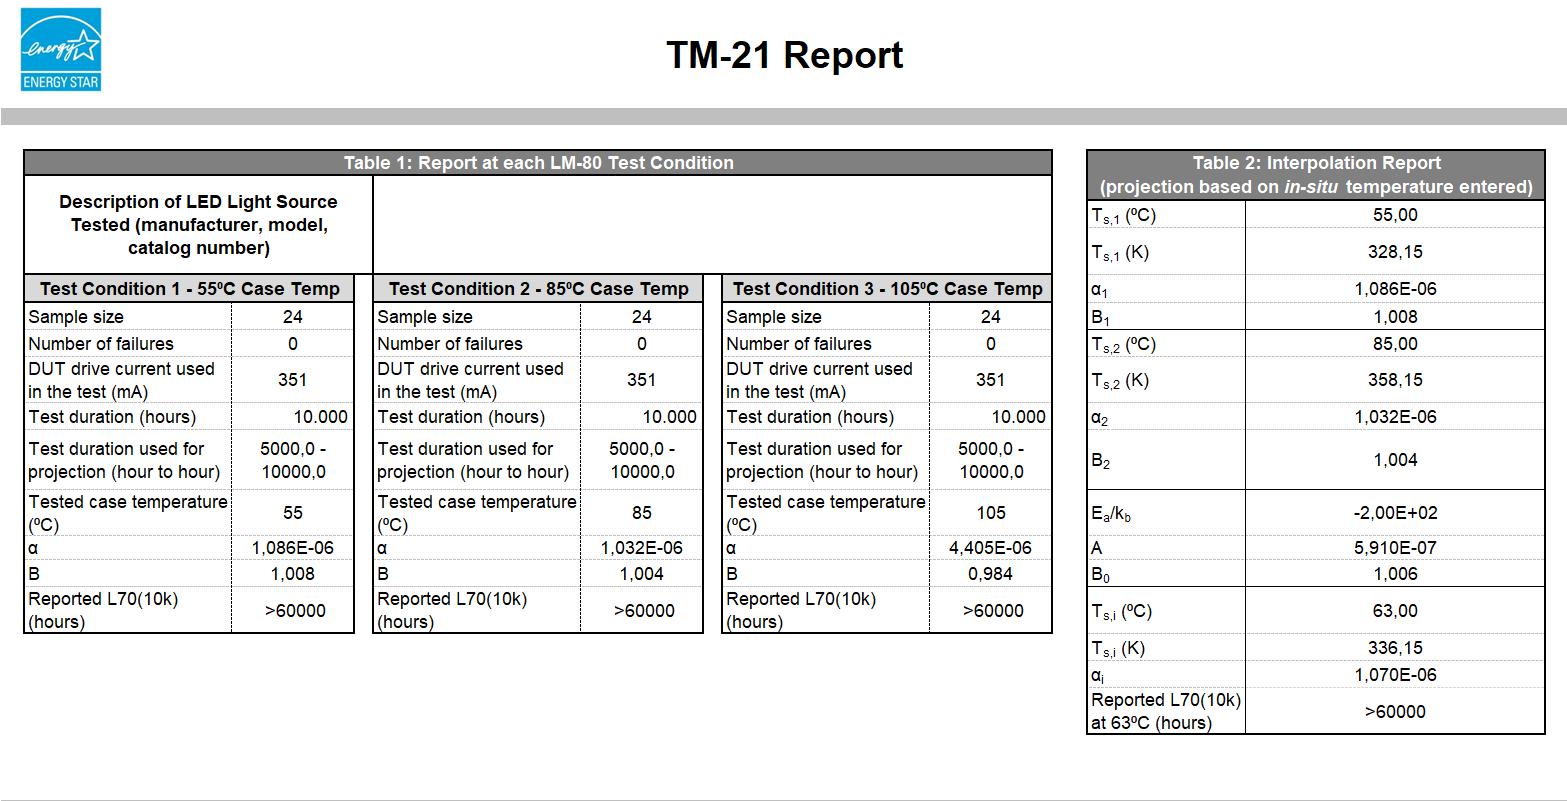 mantenimiento del flujo luminoso - TM-21 2